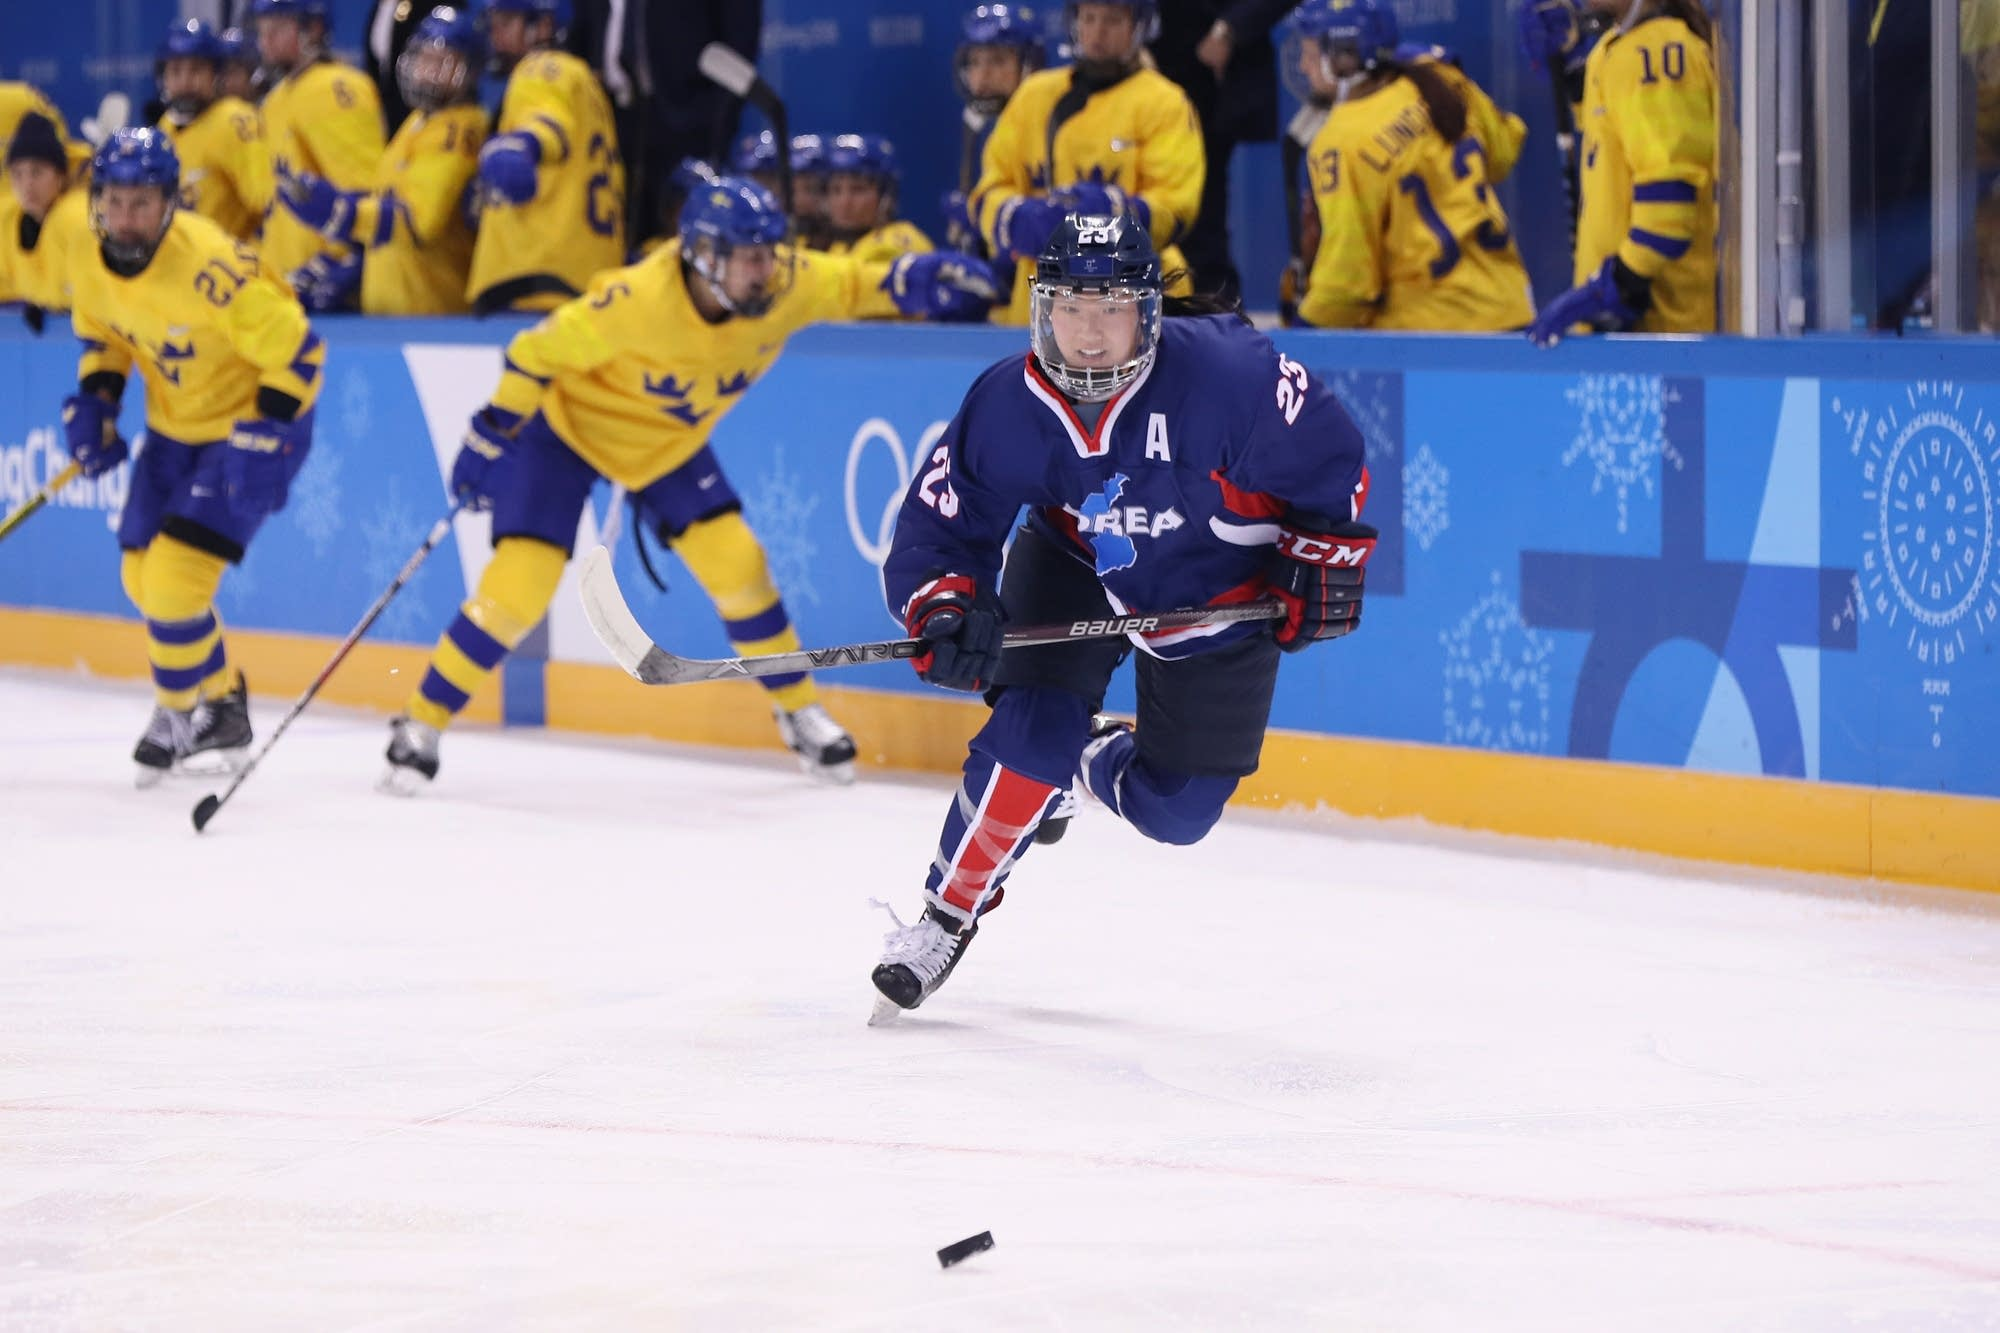 Marissa Brandt skates for the puck against Sweden